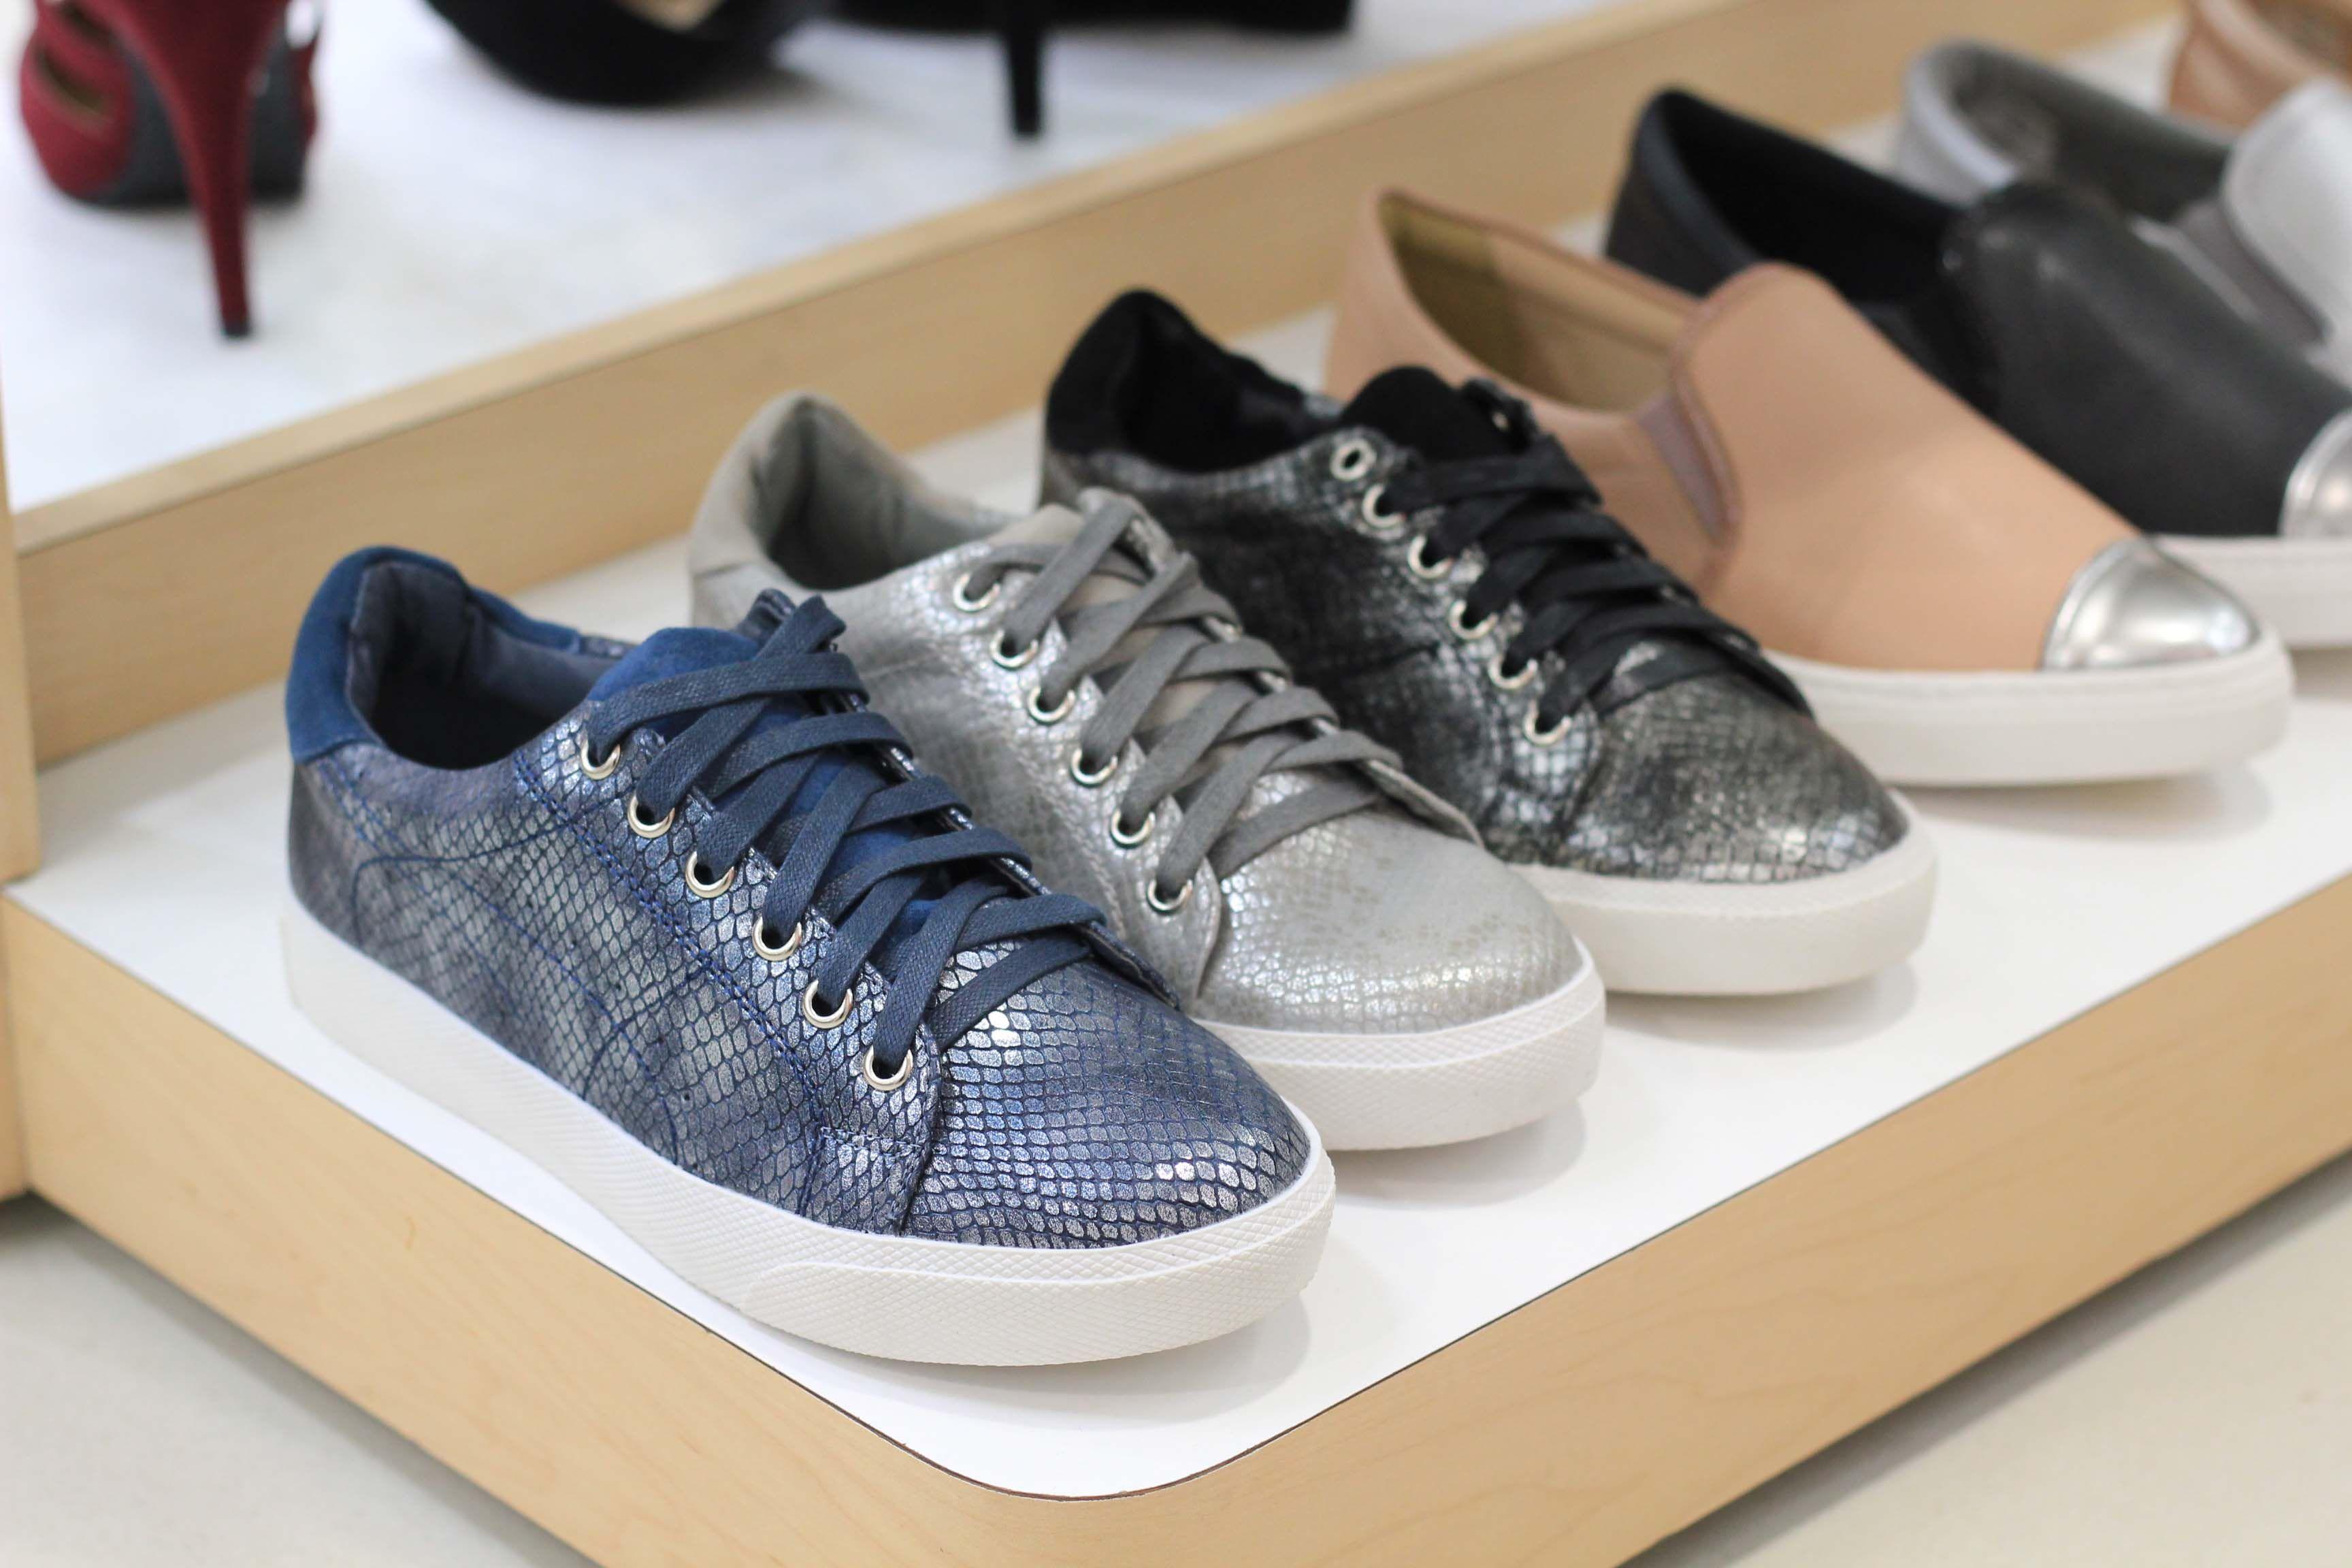 9d83cc9a0cd Resultado de imagen para calzado deportivo cuero metalizado ...